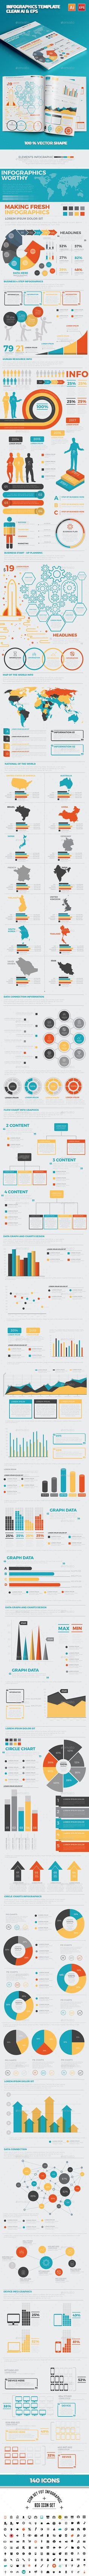 Infographics Template Design — EPS Template #modern #illustrator • Download ➝ https://graphicriver.net/item/infographics-template-design/18473496?ref=pxcr